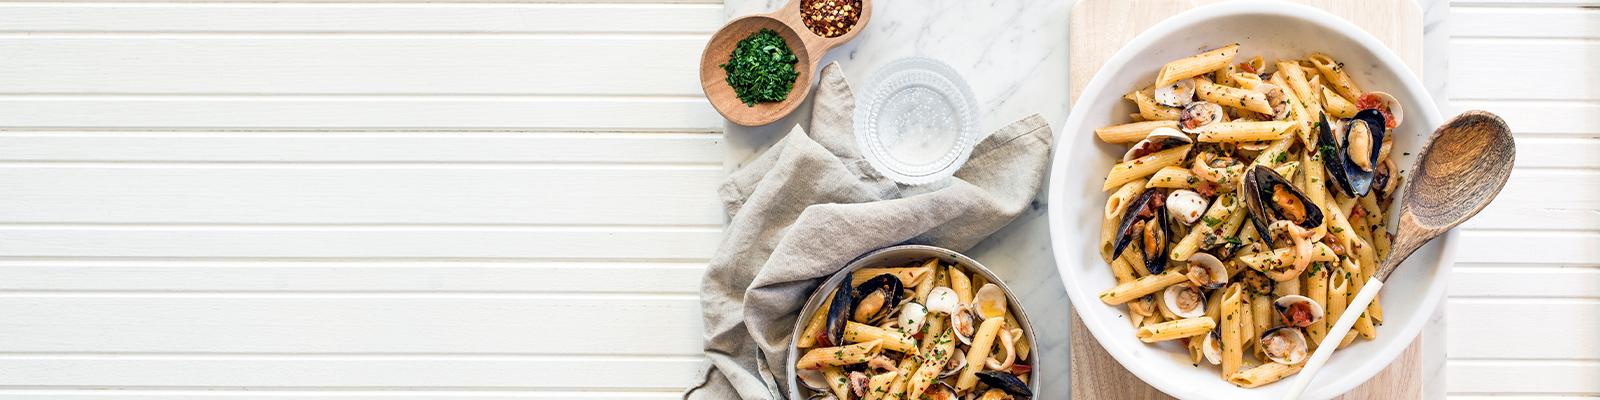 Pasta Garofalo - Unsere Rezepte